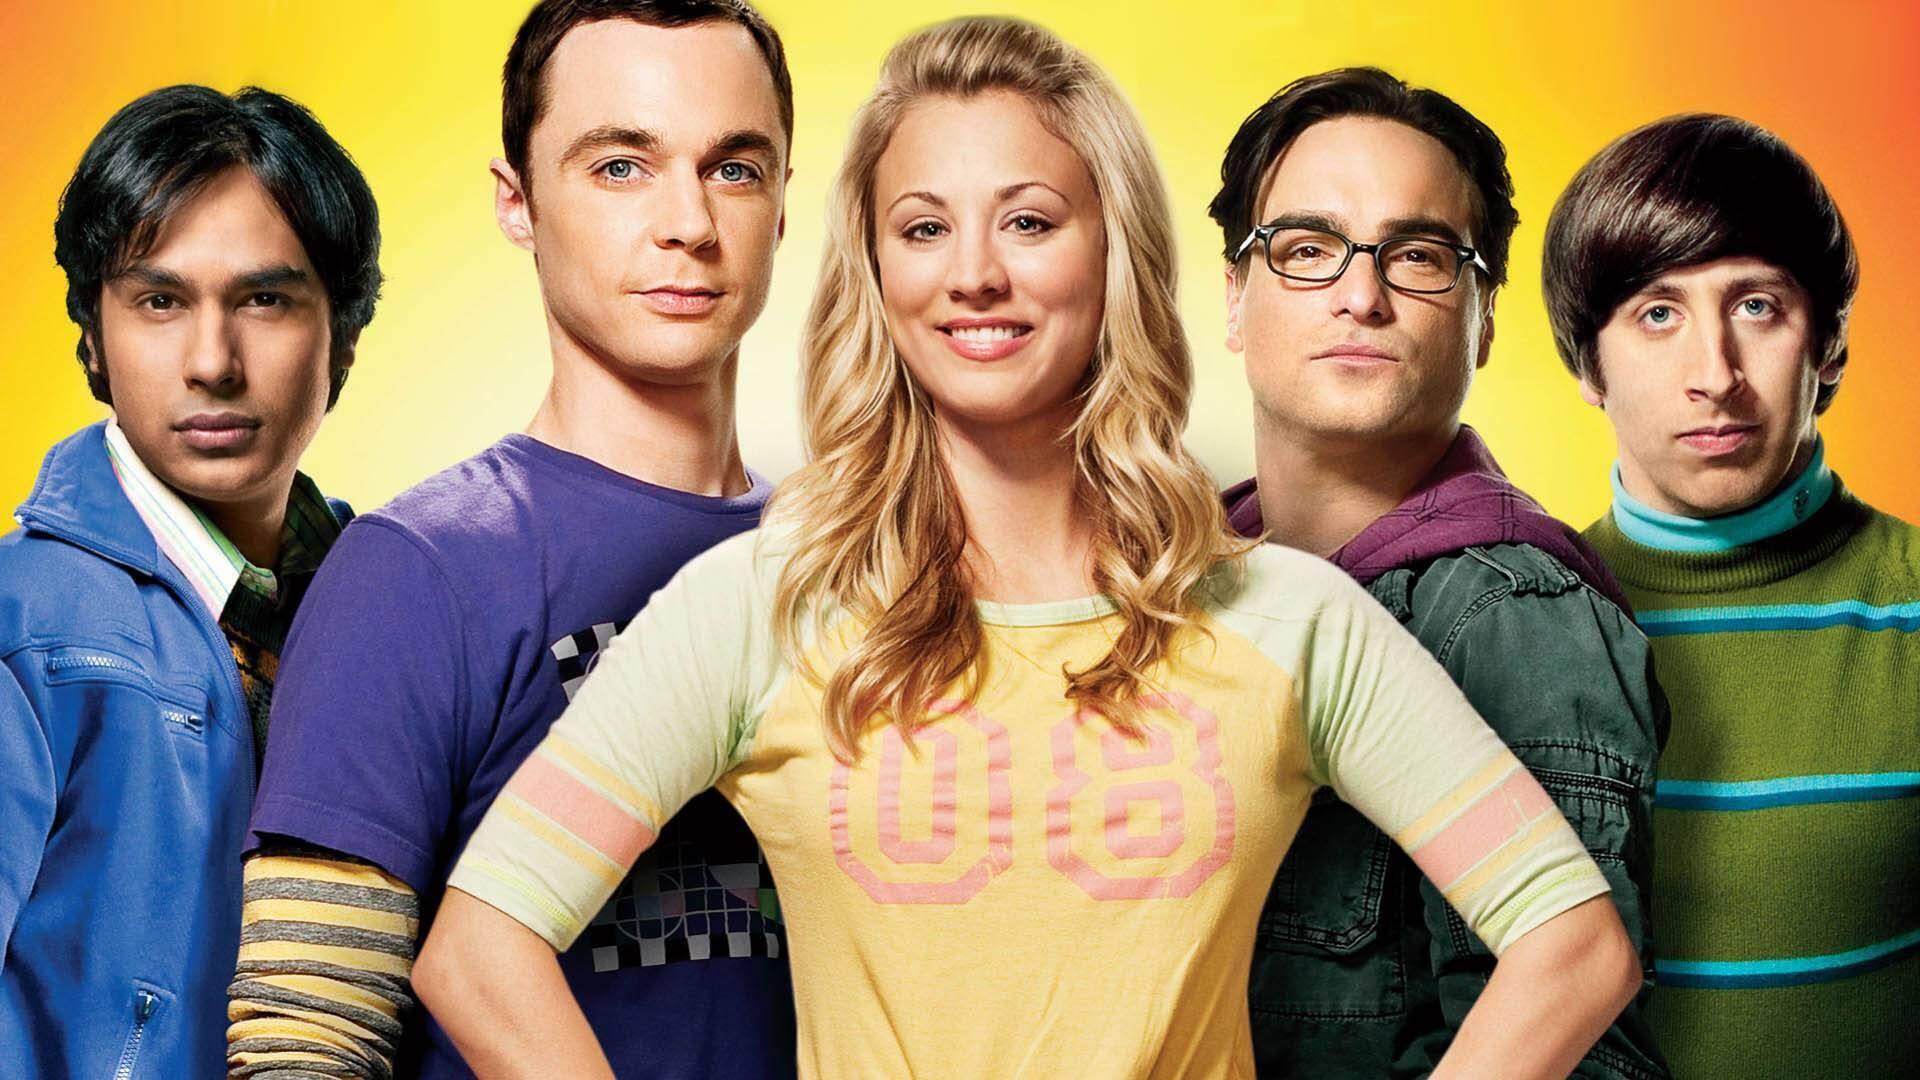 The Big Bang Theory 8, le riprese sono cominciate!